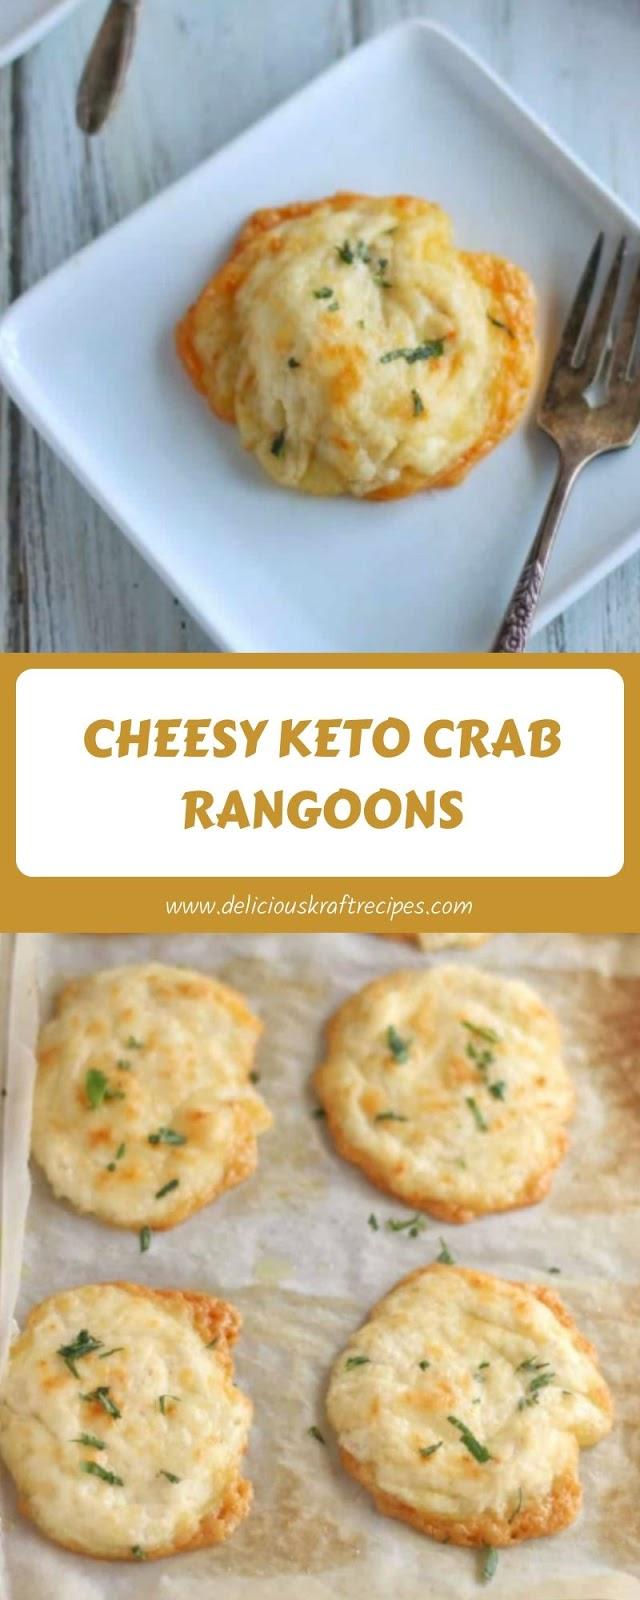 CHEESY KETO CRAB RANGOONS